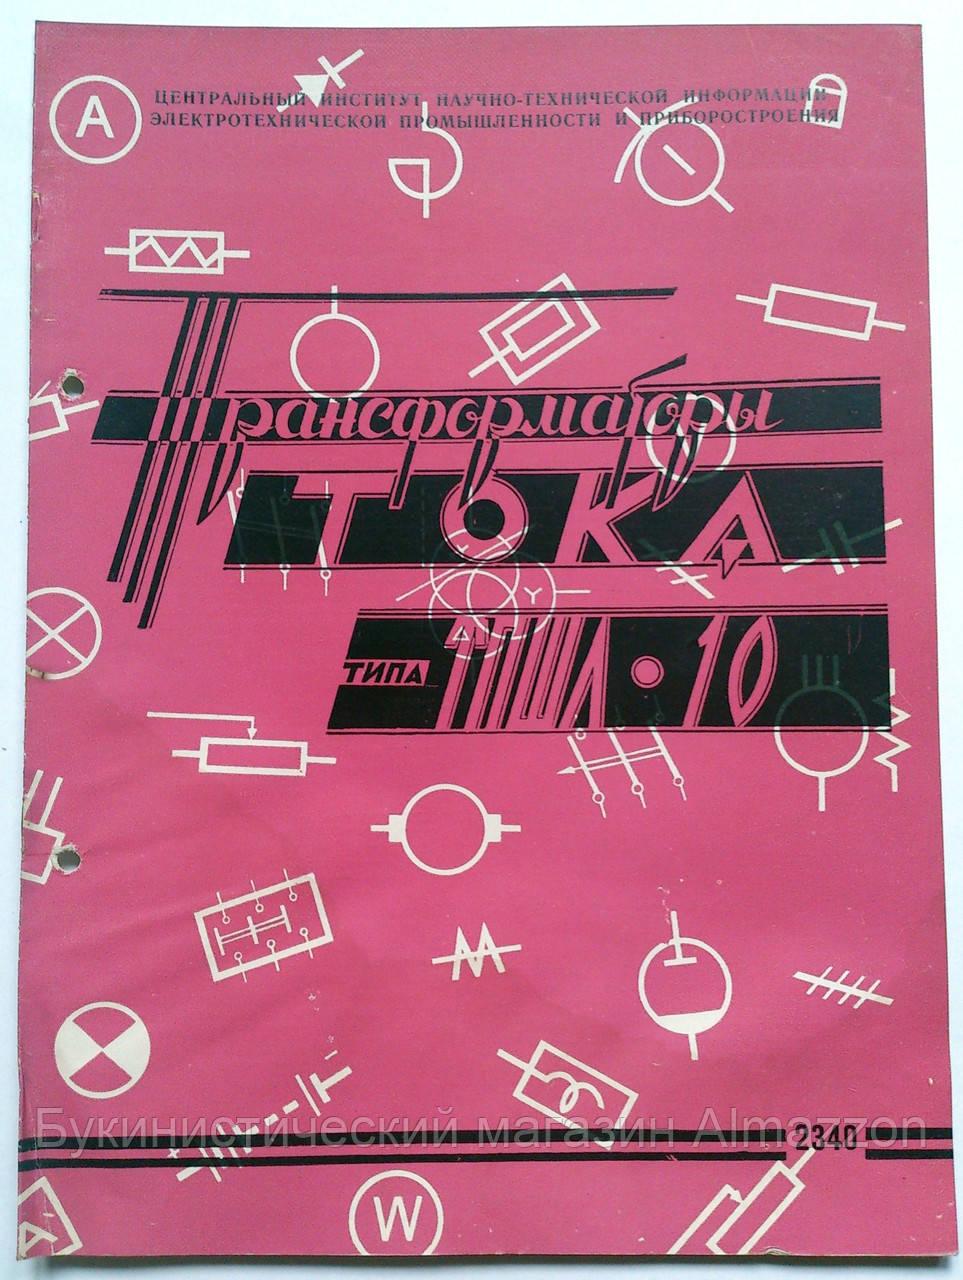 "Журнал (Бюллетень) ""Трансформаторы тока типа ТПШЛ-10"" 1961 год"